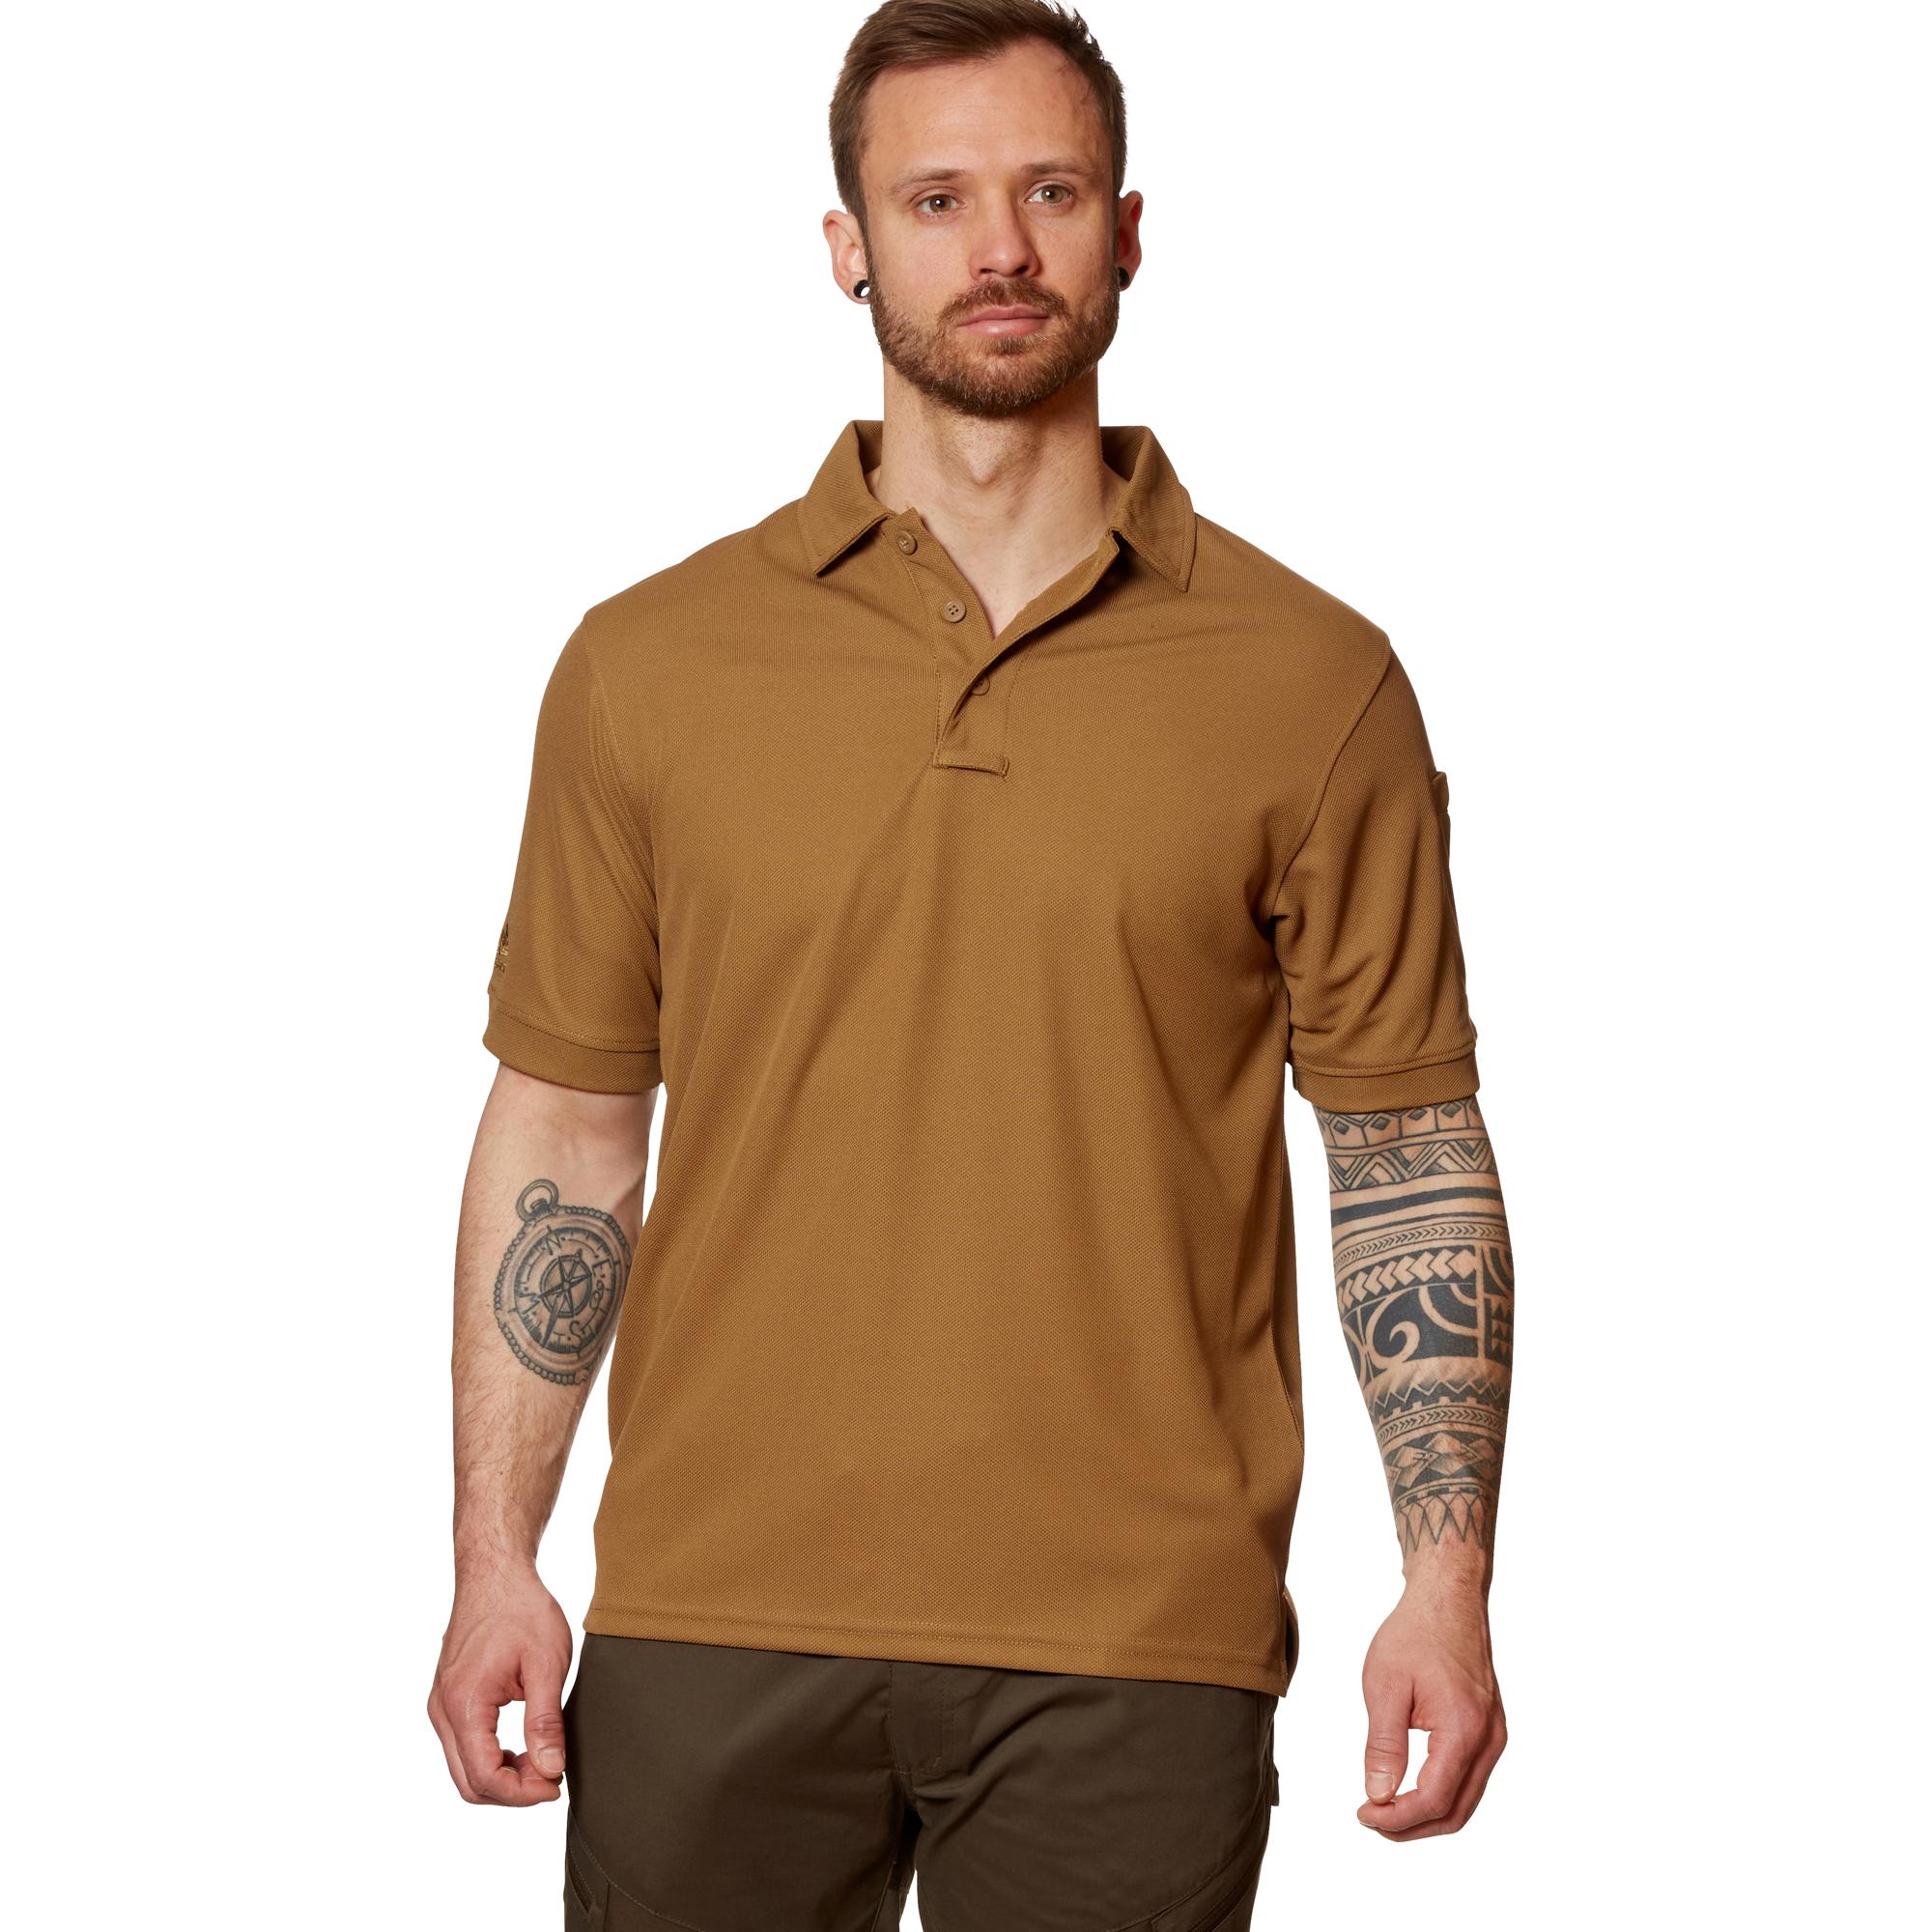 Helikon-Tex Polo Shirt UTL TopCool coyote